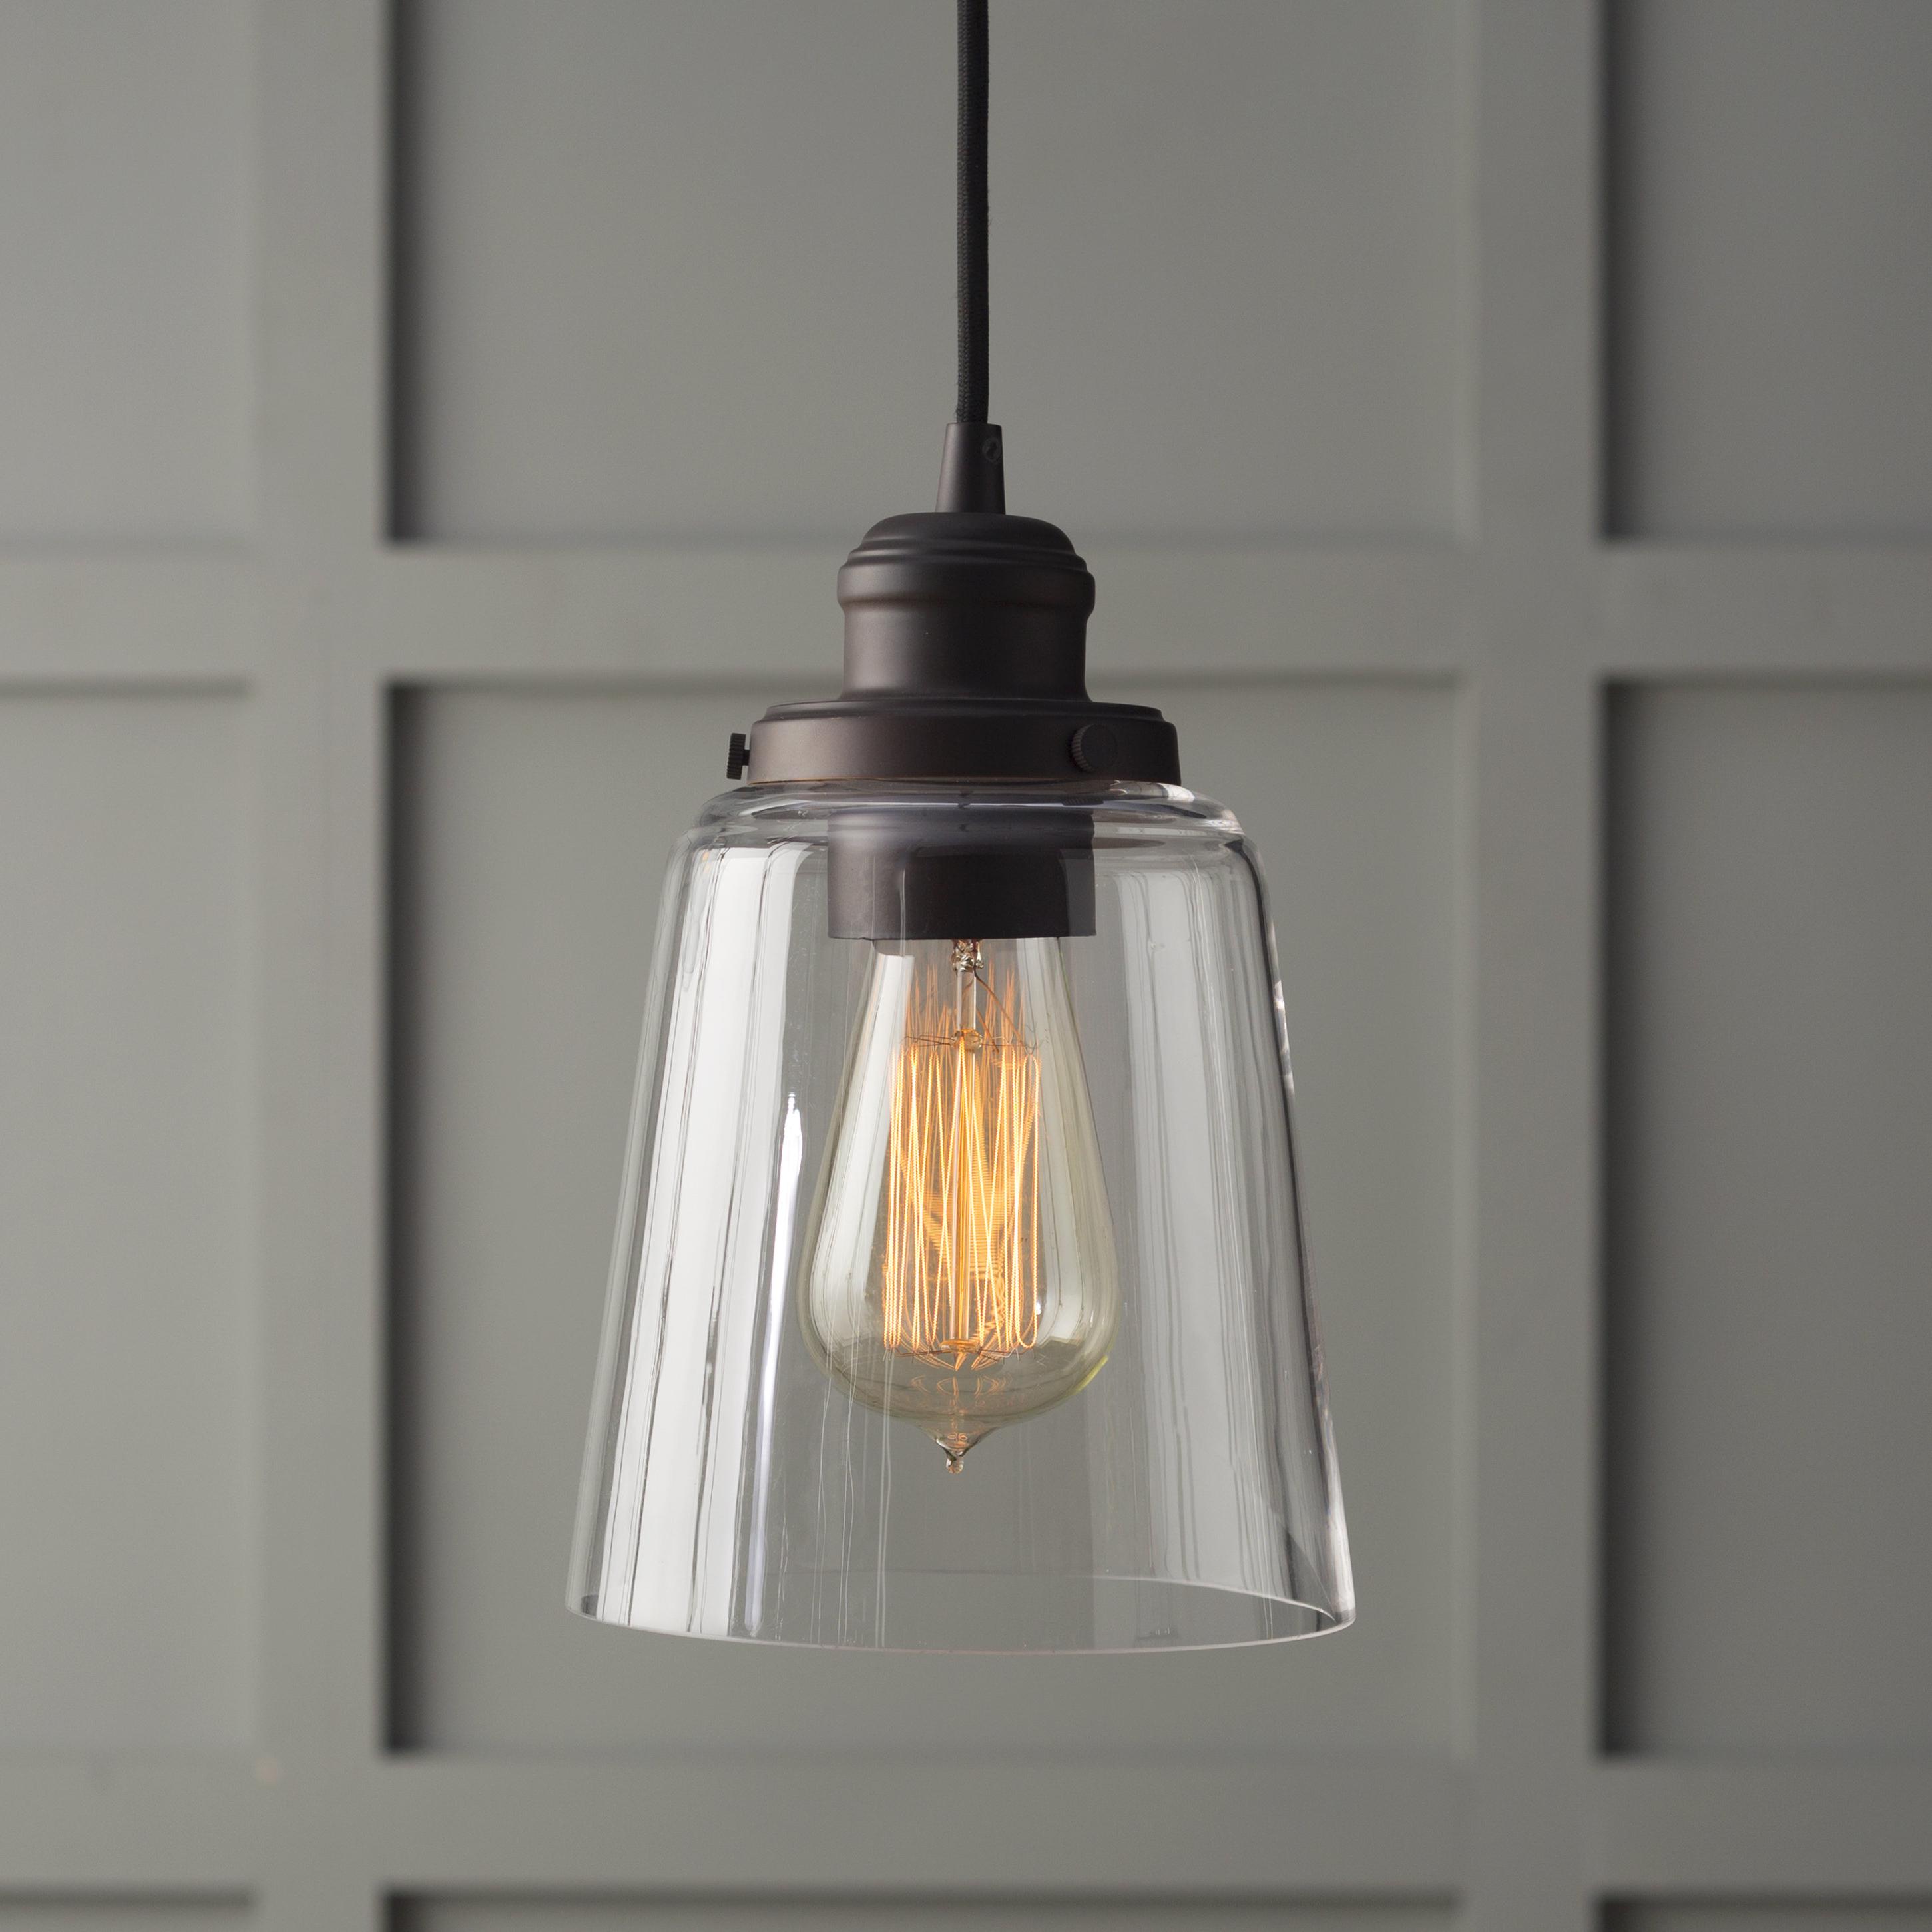 Widely Used Bundaberg 1 Light Single Bell Pendants Intended For 1 Light Single Bell Pendant (View 20 of 20)